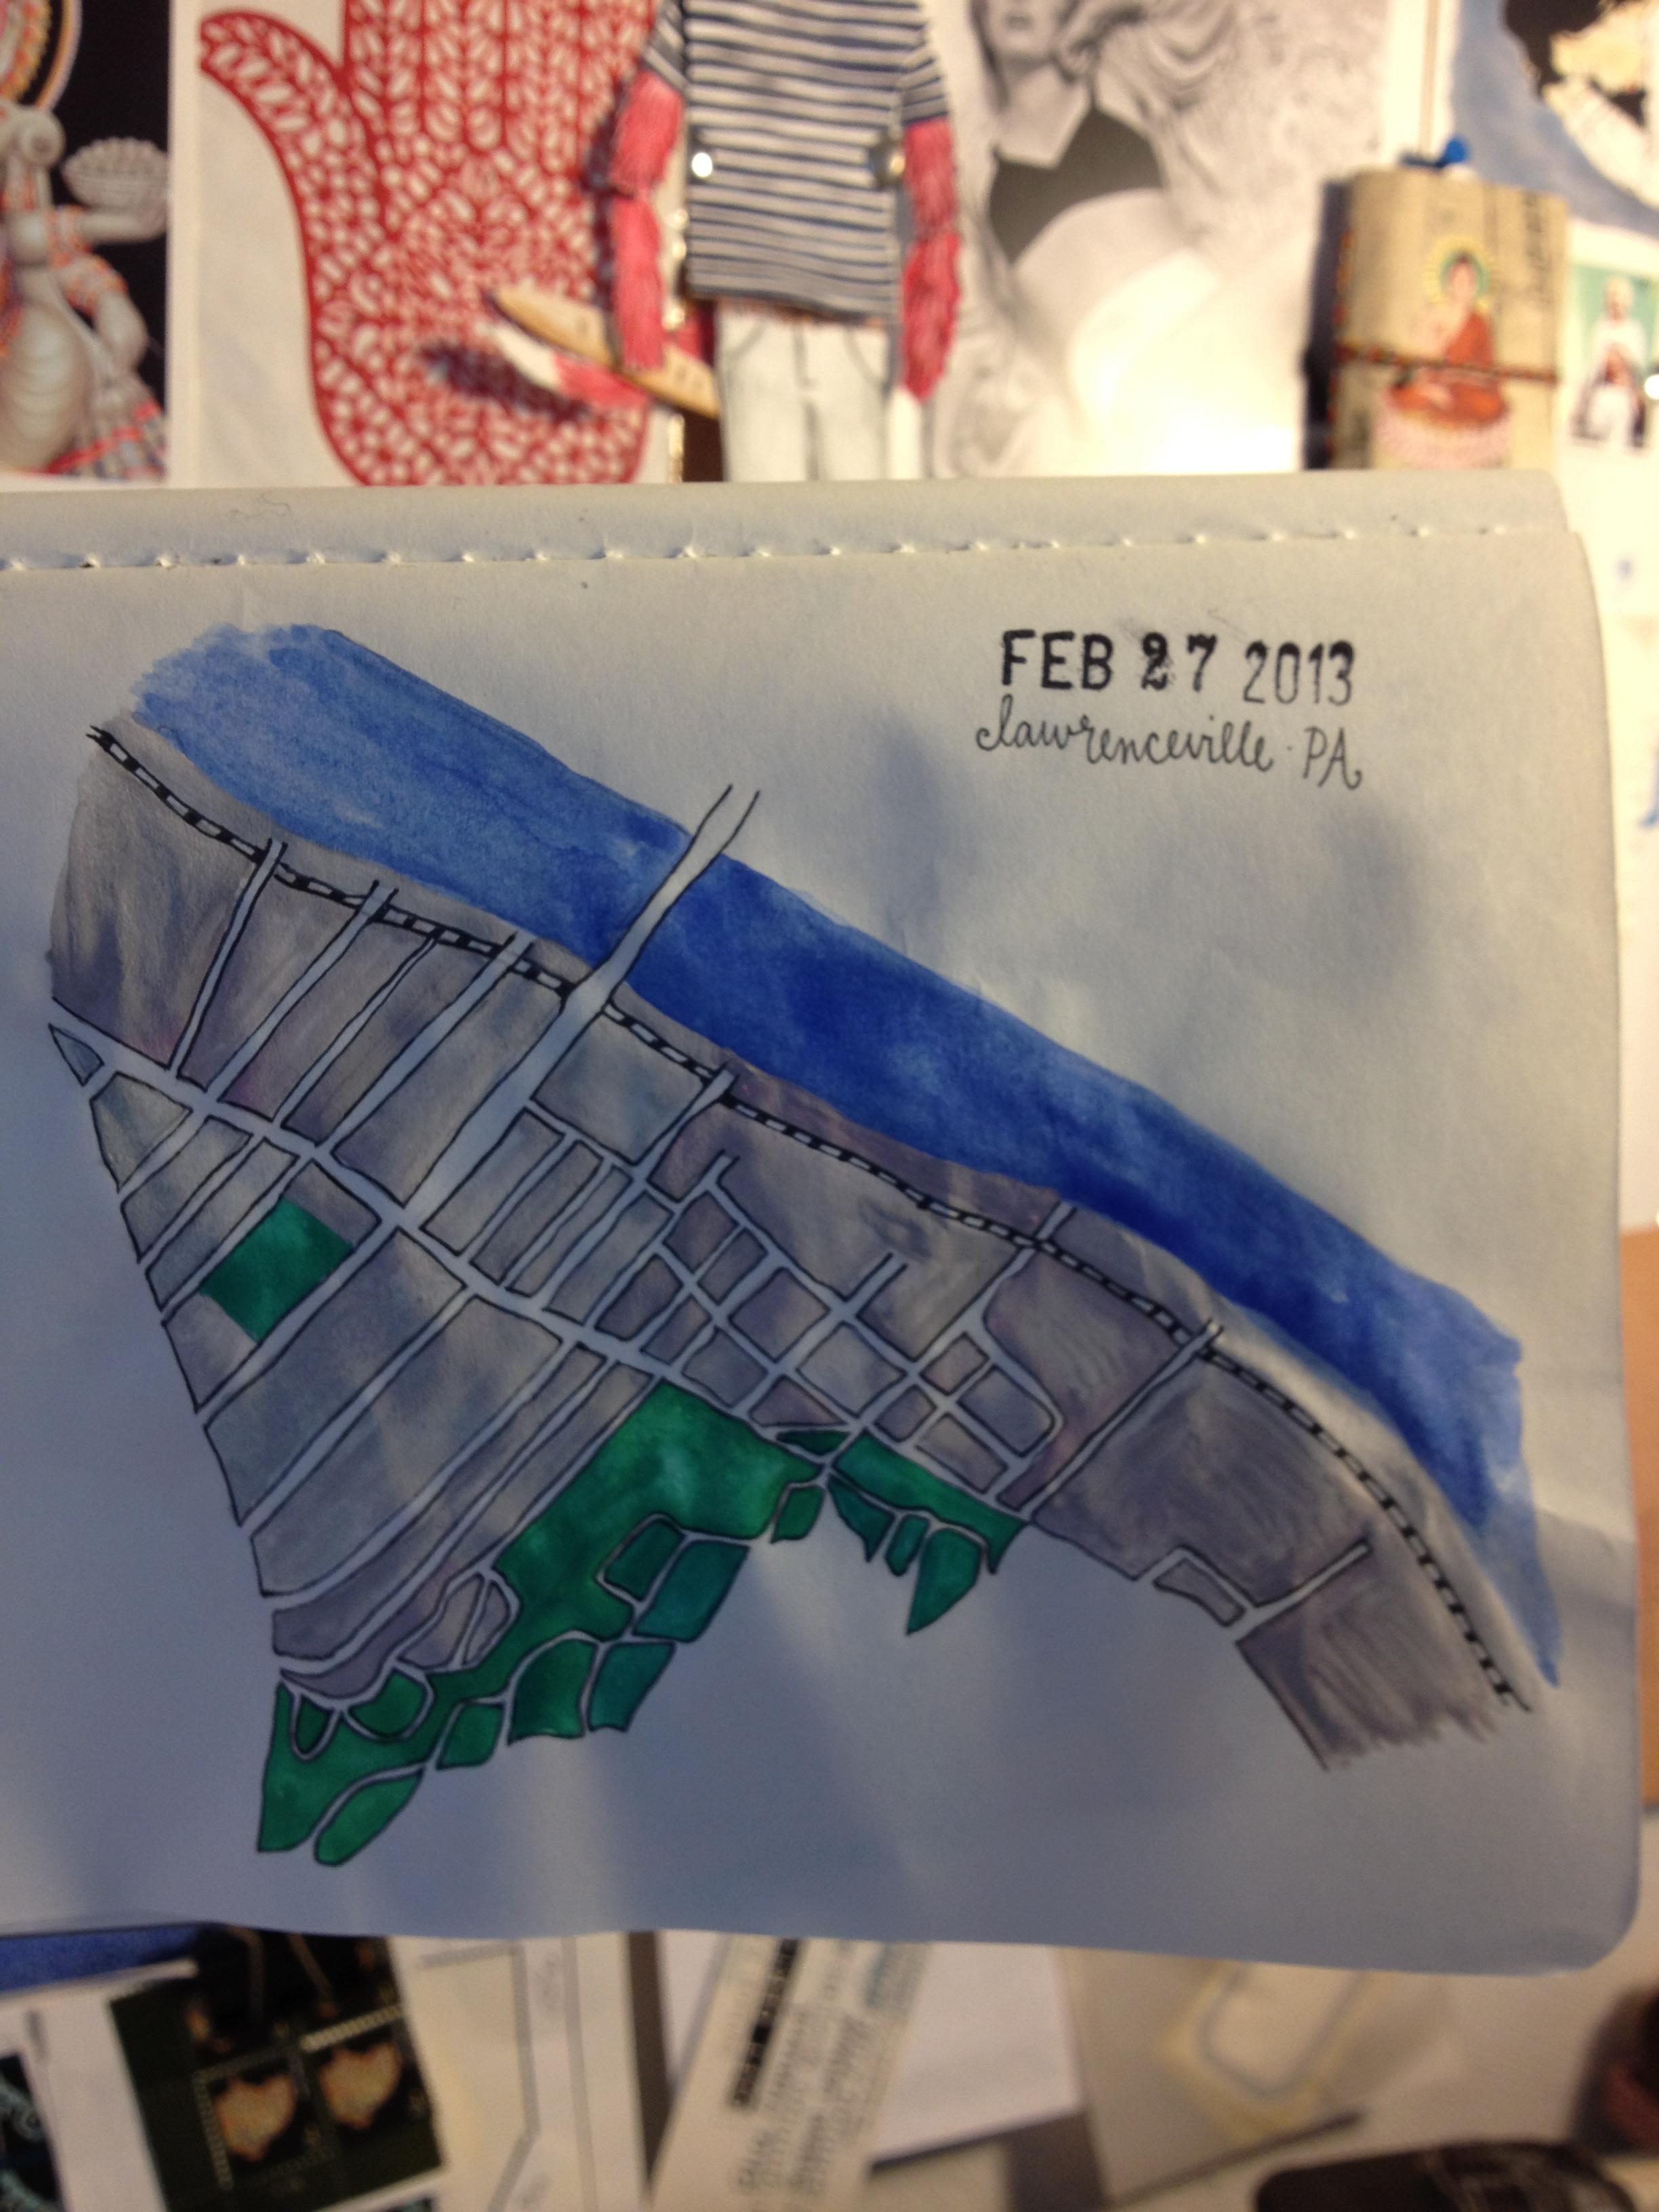 pittsburgh // neighborhoods // drawings  - image 2 - student project